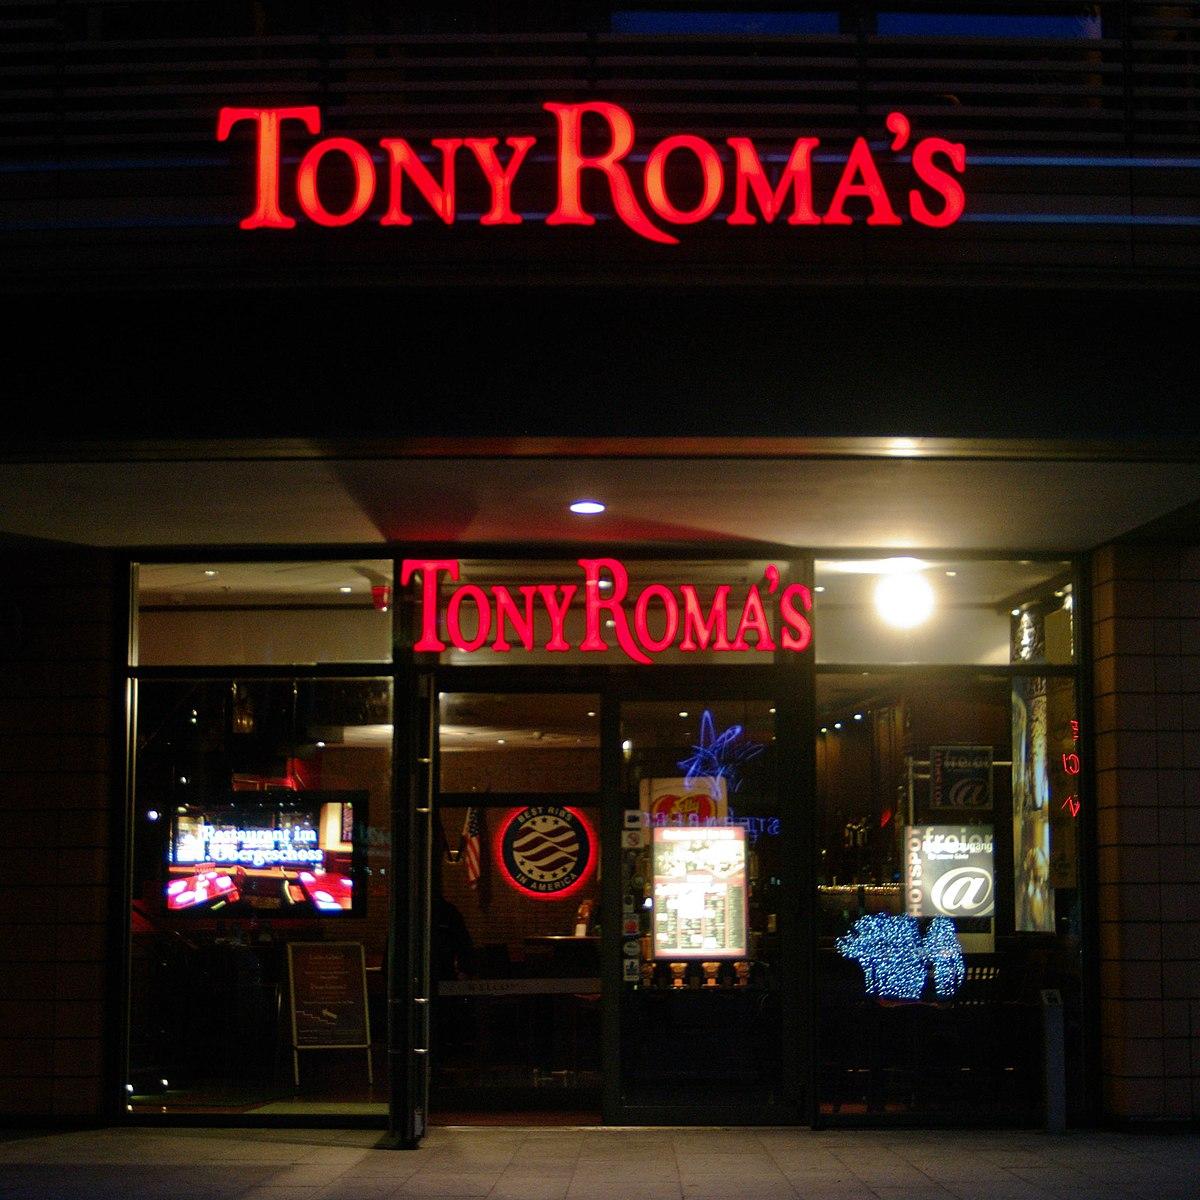 Tony Romas  Wikipedia la enciclopedia libre